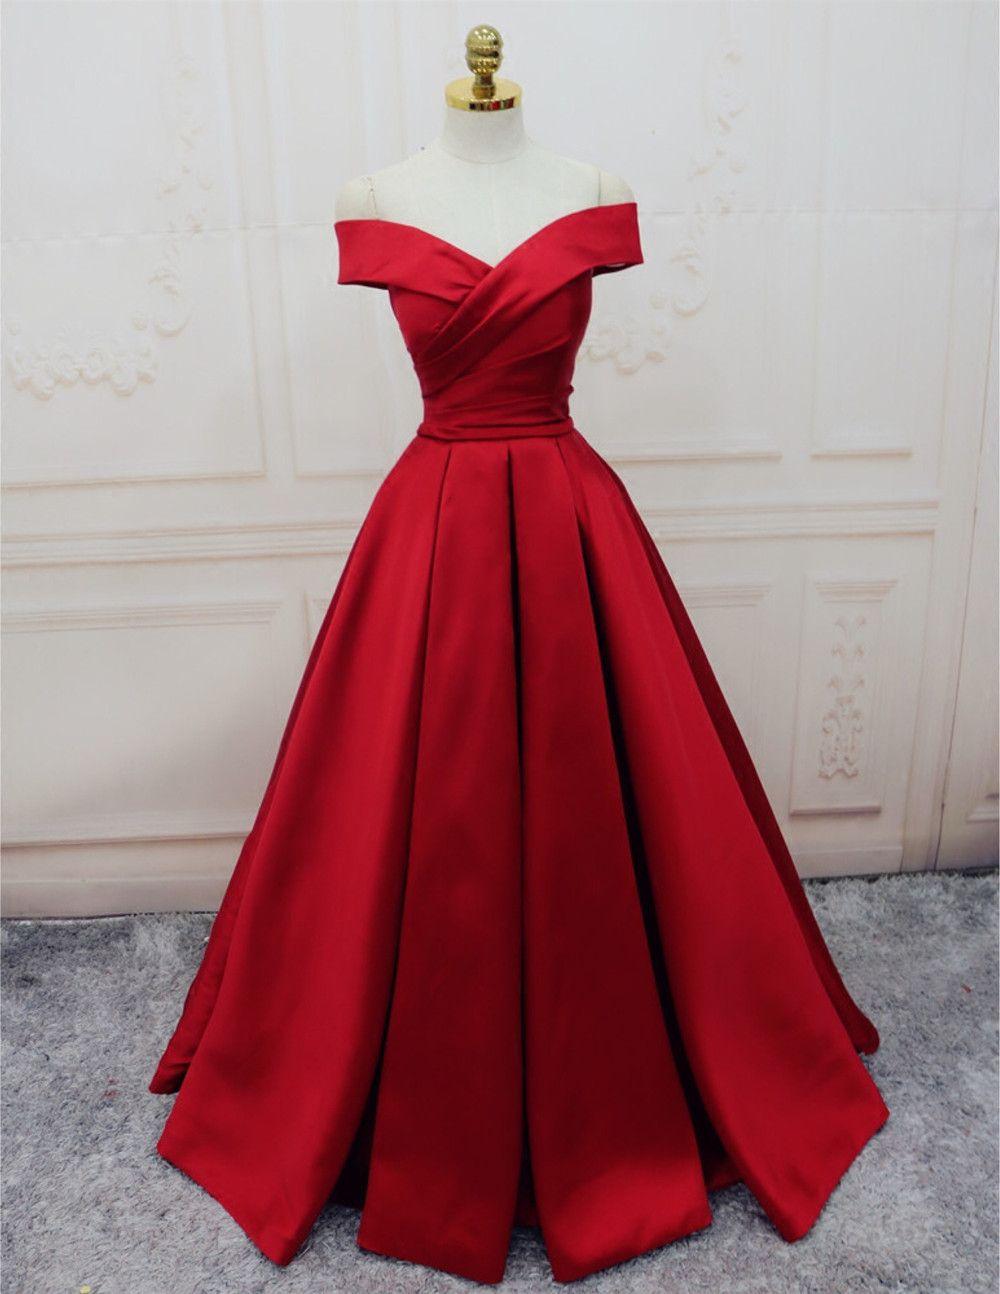 Satin evening gownsoff the shoulder prom dressburgundy prom dress